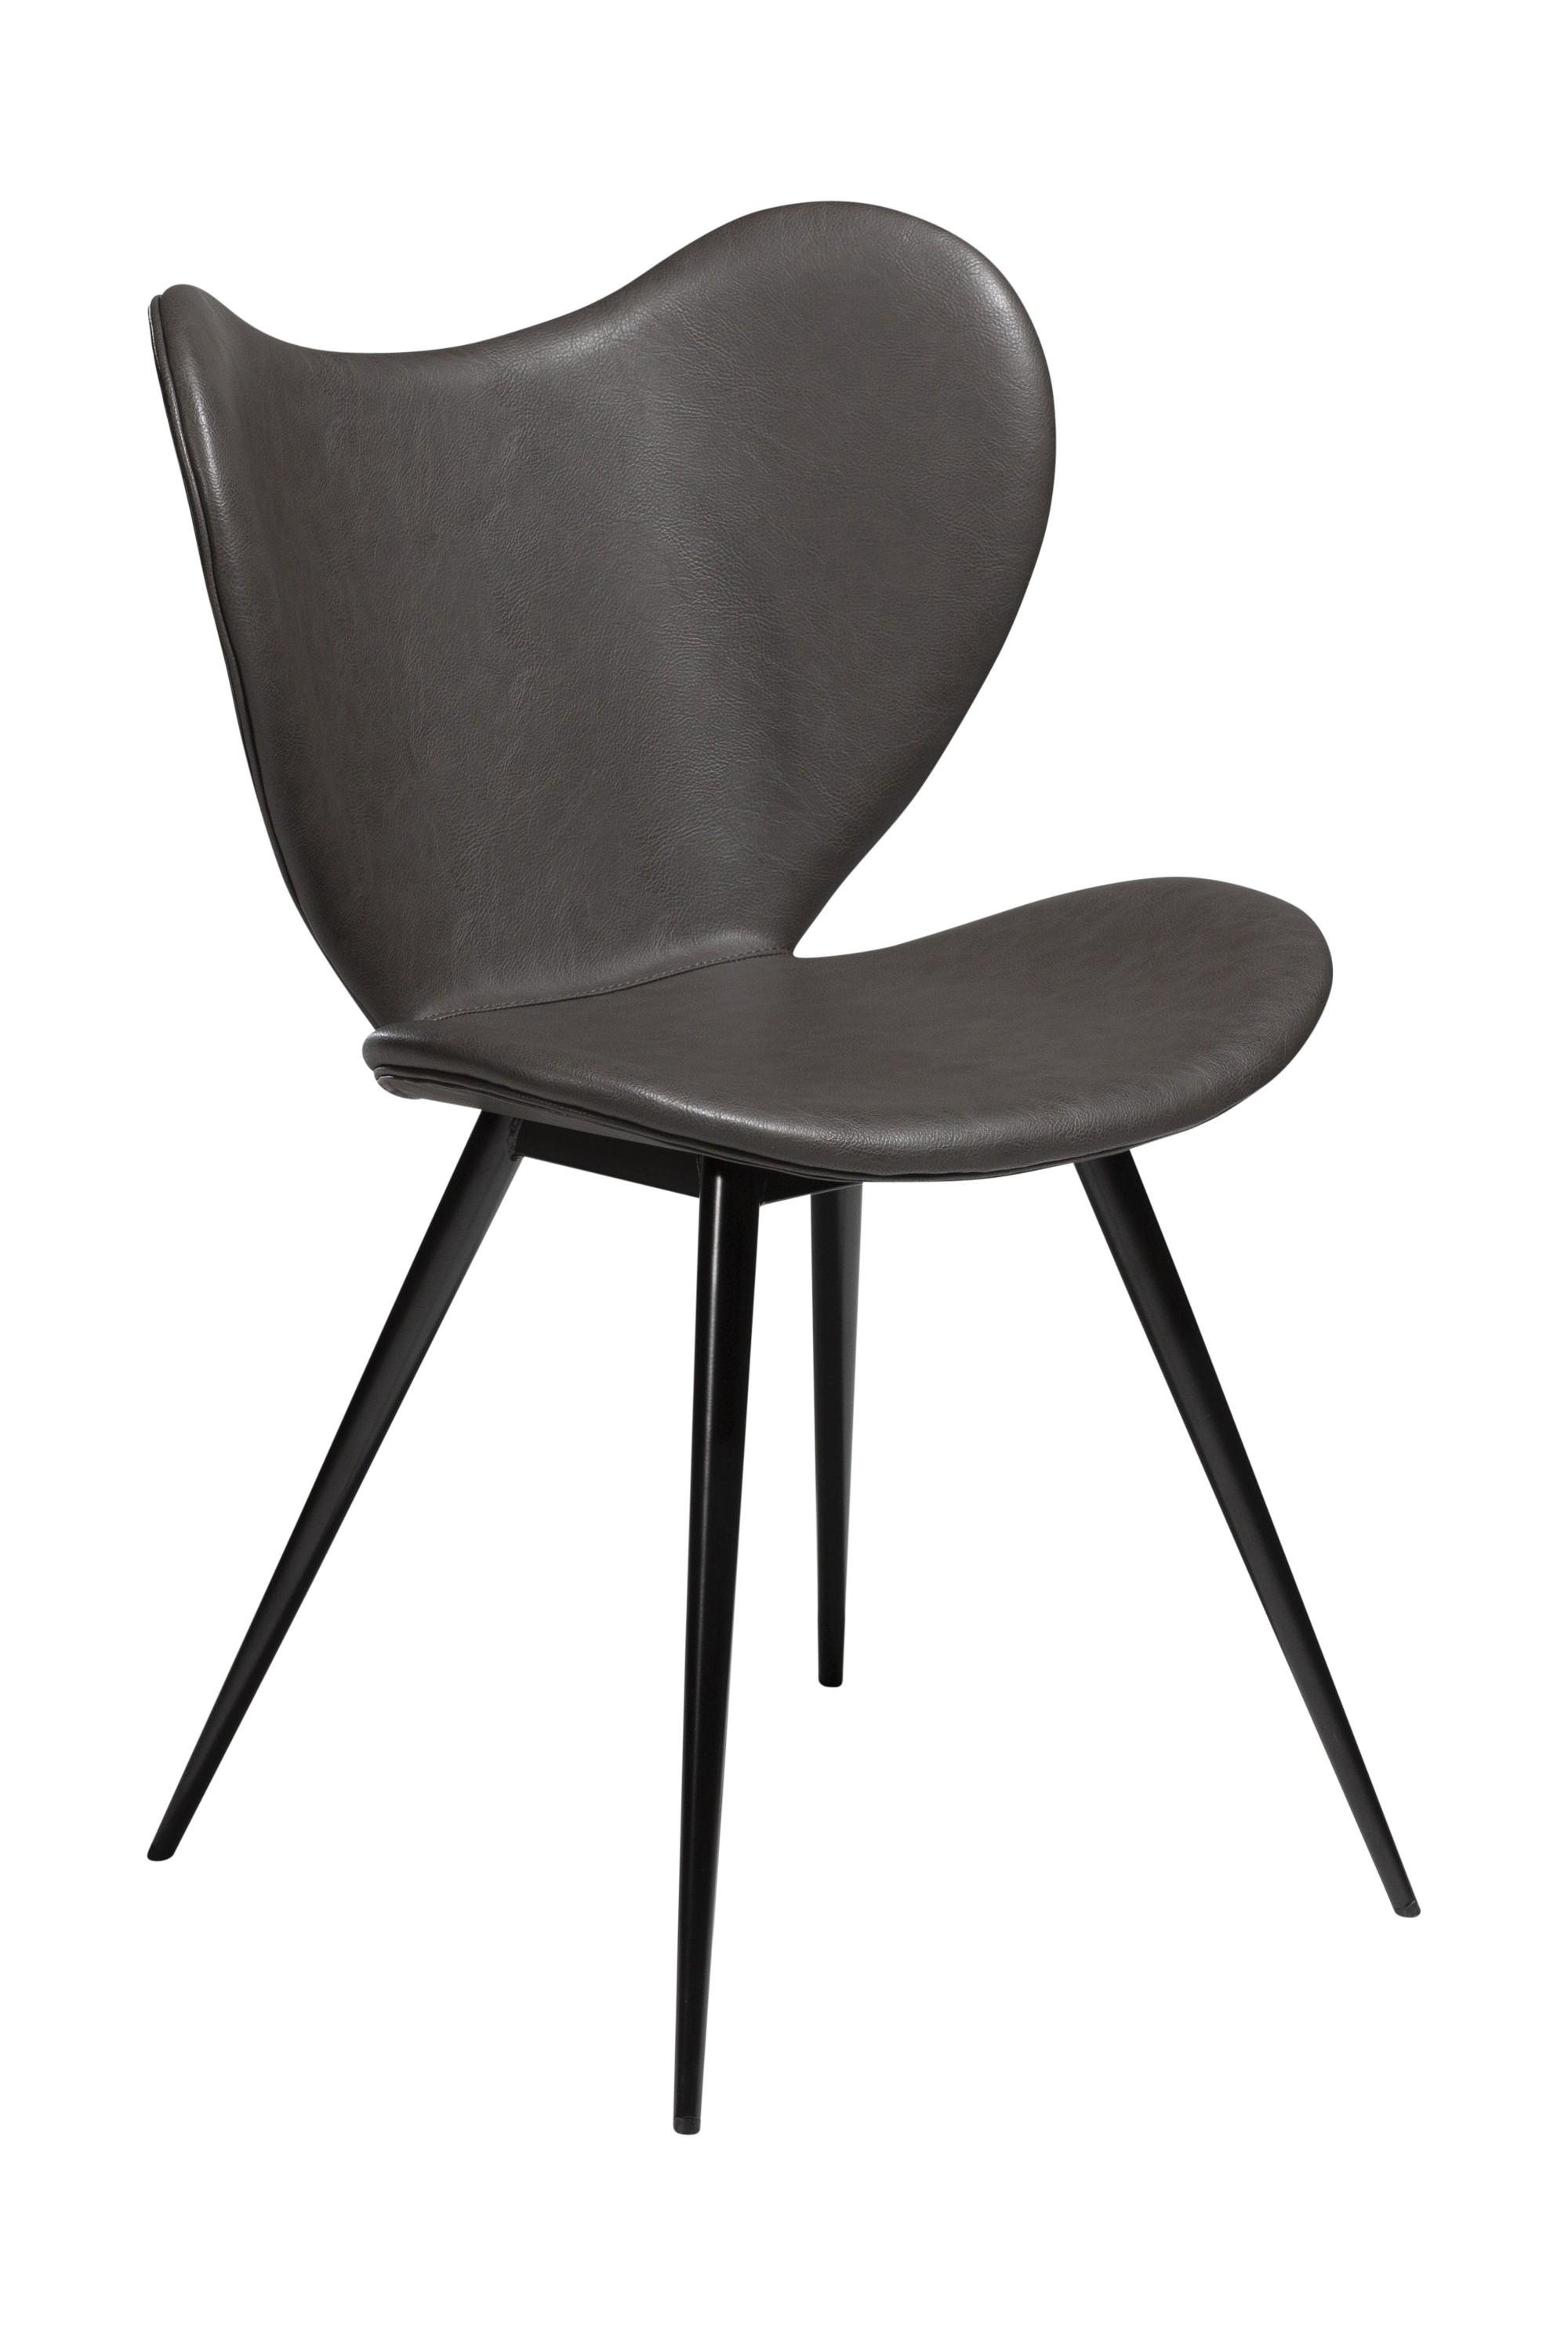 2x design esszimmerstuhl kunstleder küche stuhl stühle set esszimmer grau |  dynamic-24.de